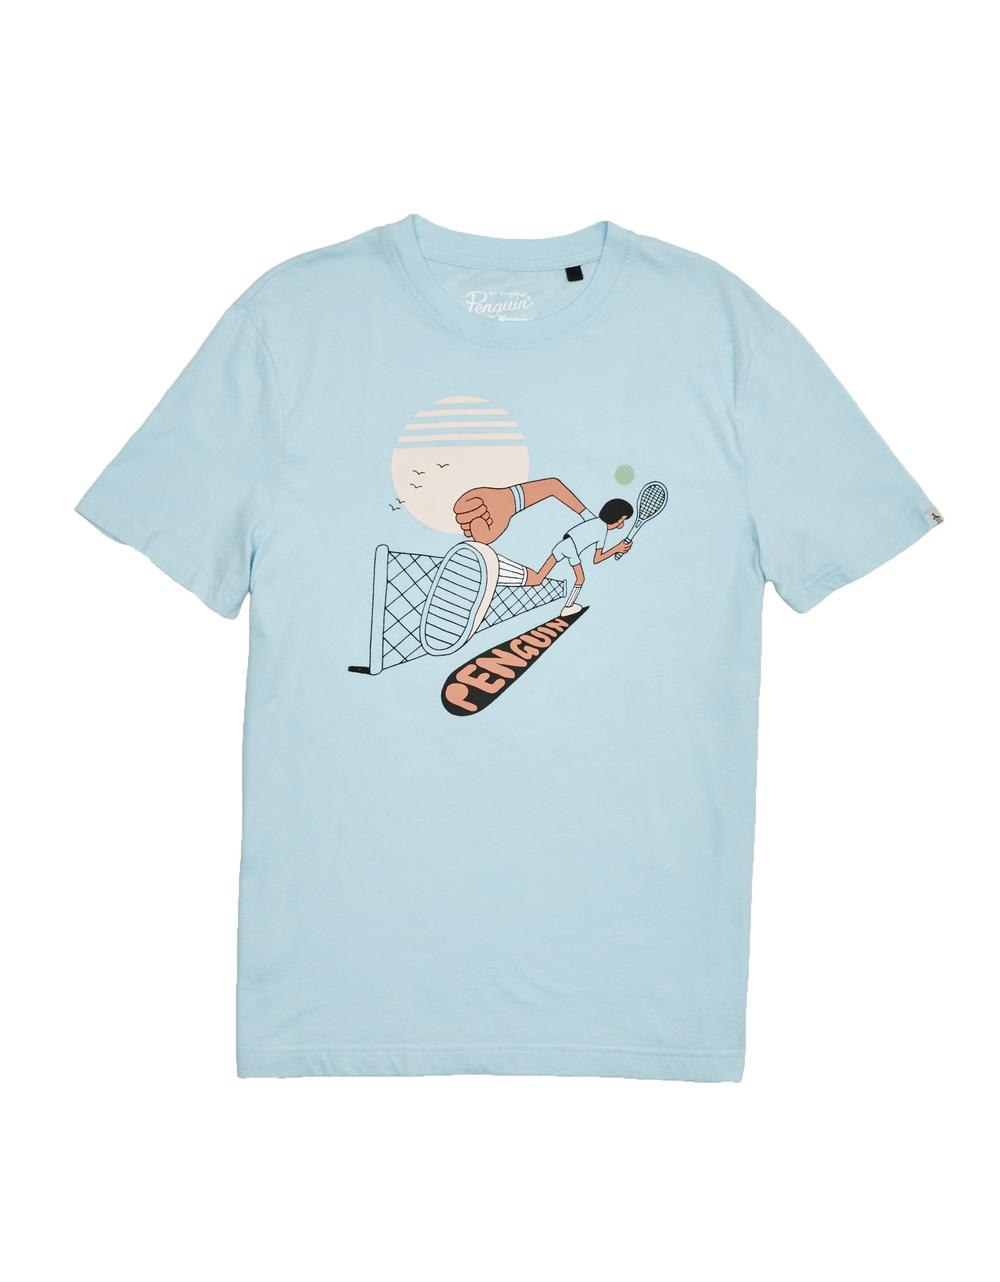 Jeremyville Tshirt 2.jpg